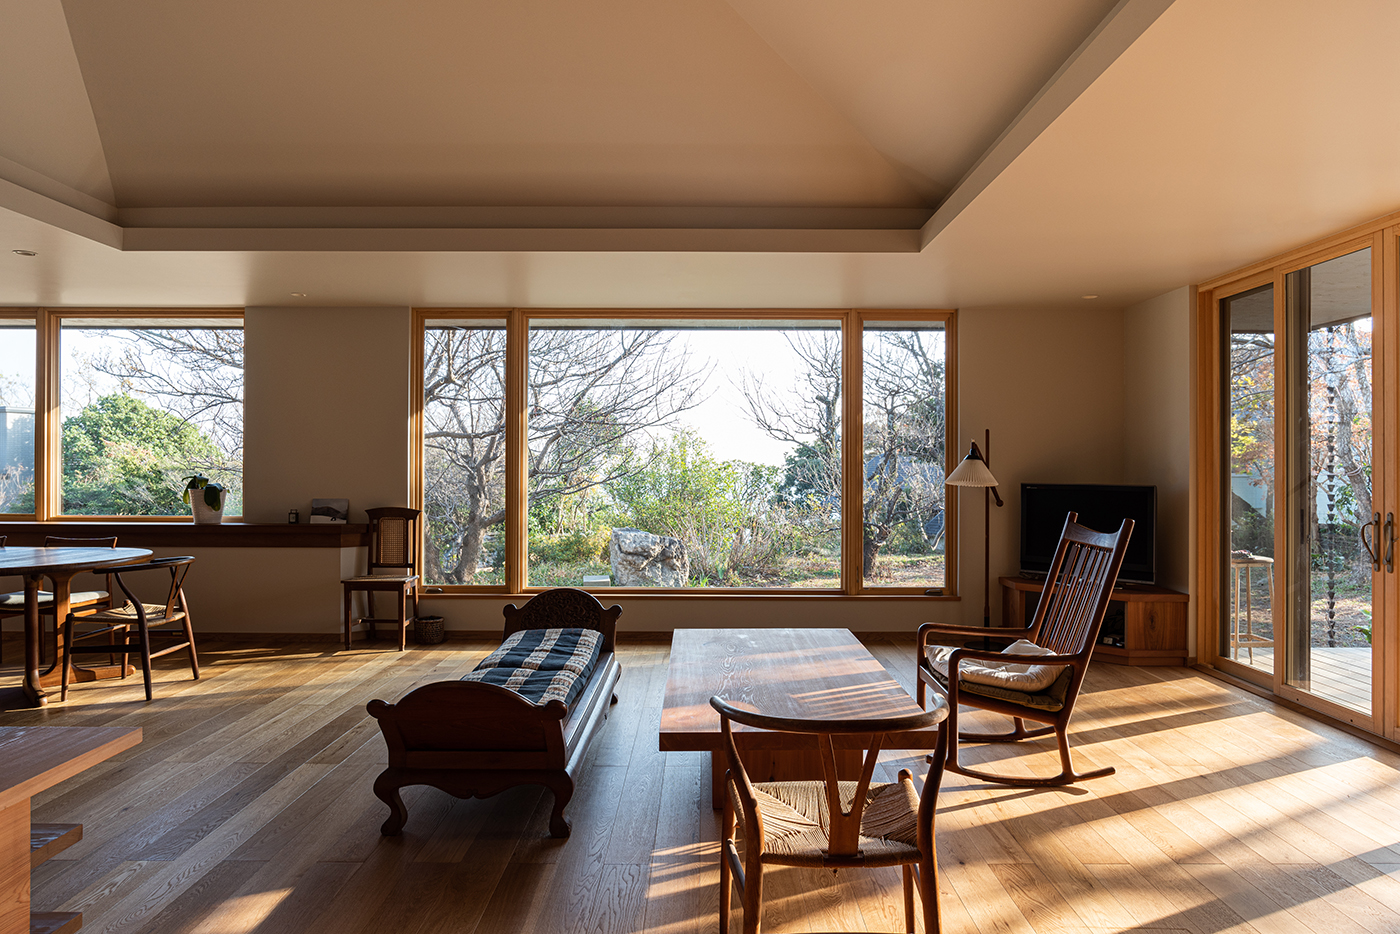 平屋、全館空調、天窓、ウッドデッキ、設計事務所、建築家、大磯、神奈川